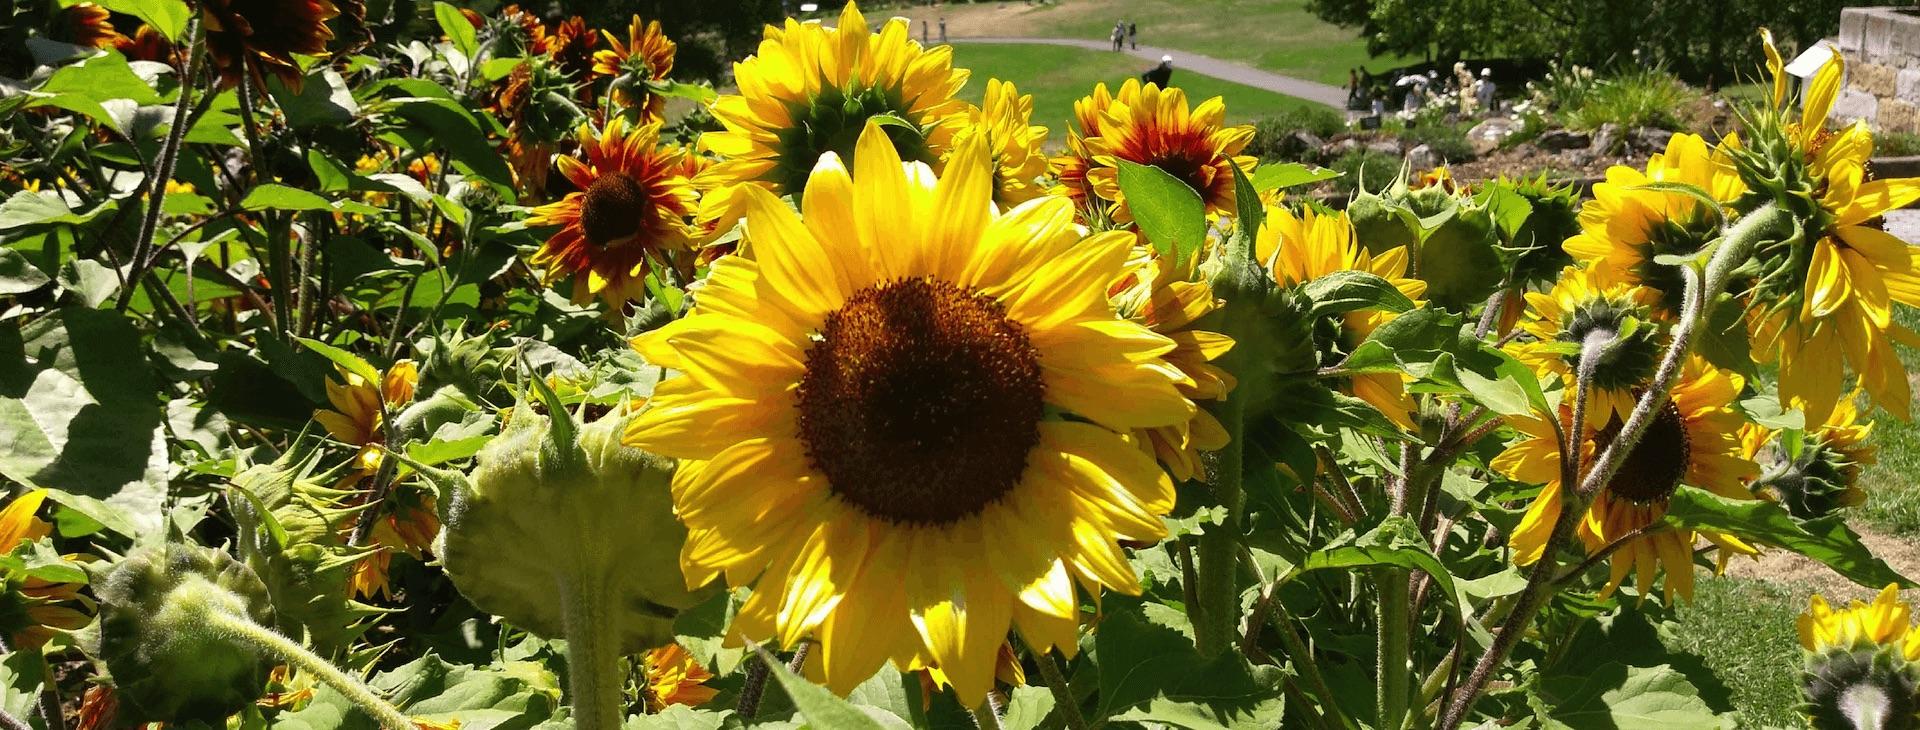 Royal Tasmanian Botanic Gardens Website - Sunflower image